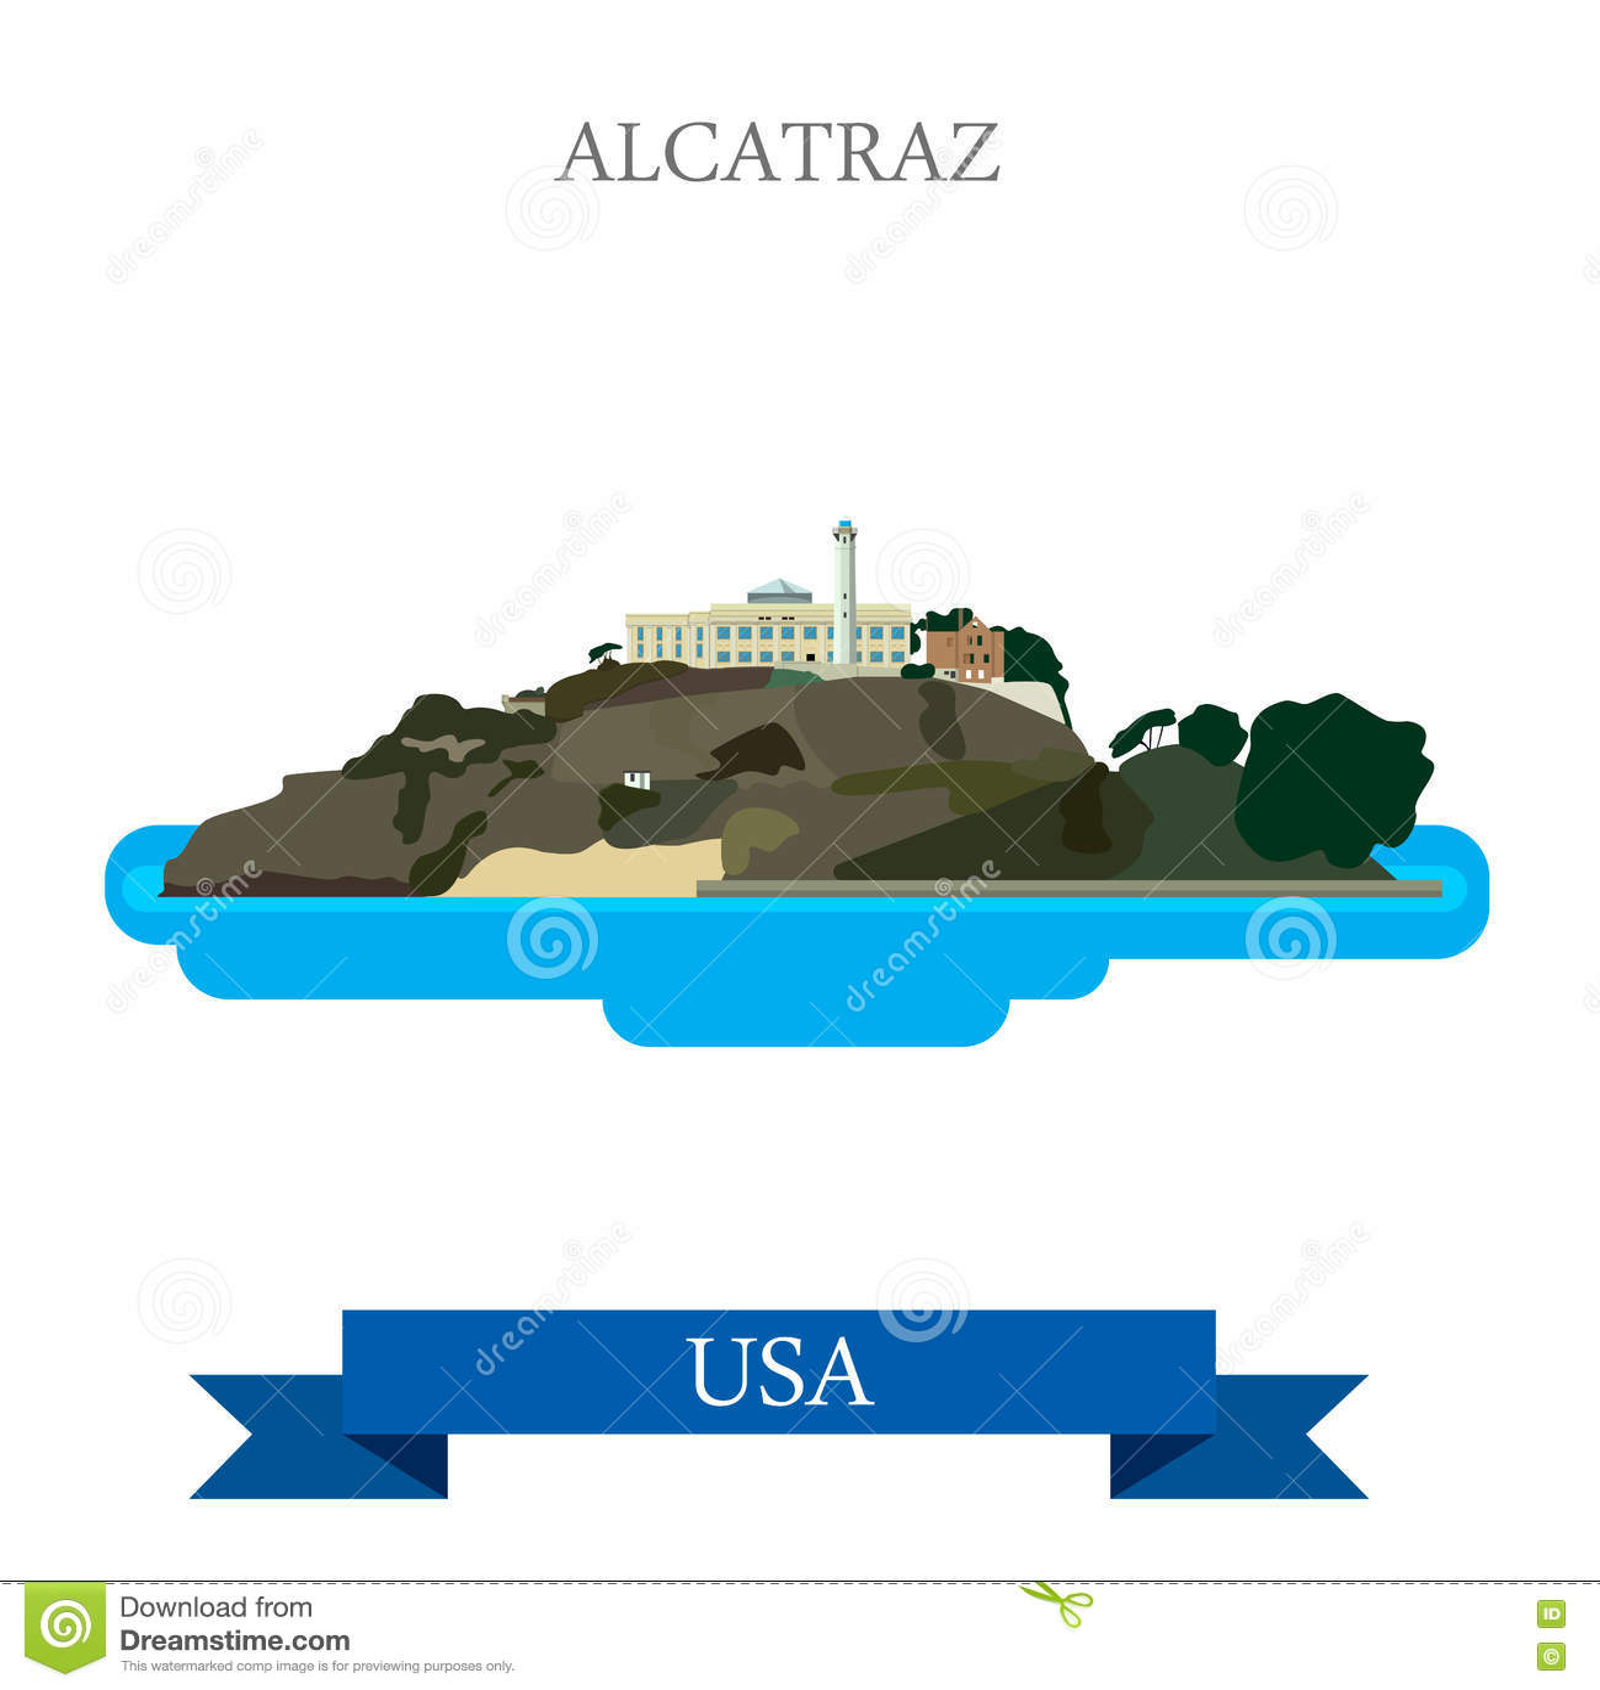 NEW World Travel POSTER Alcatraz Island